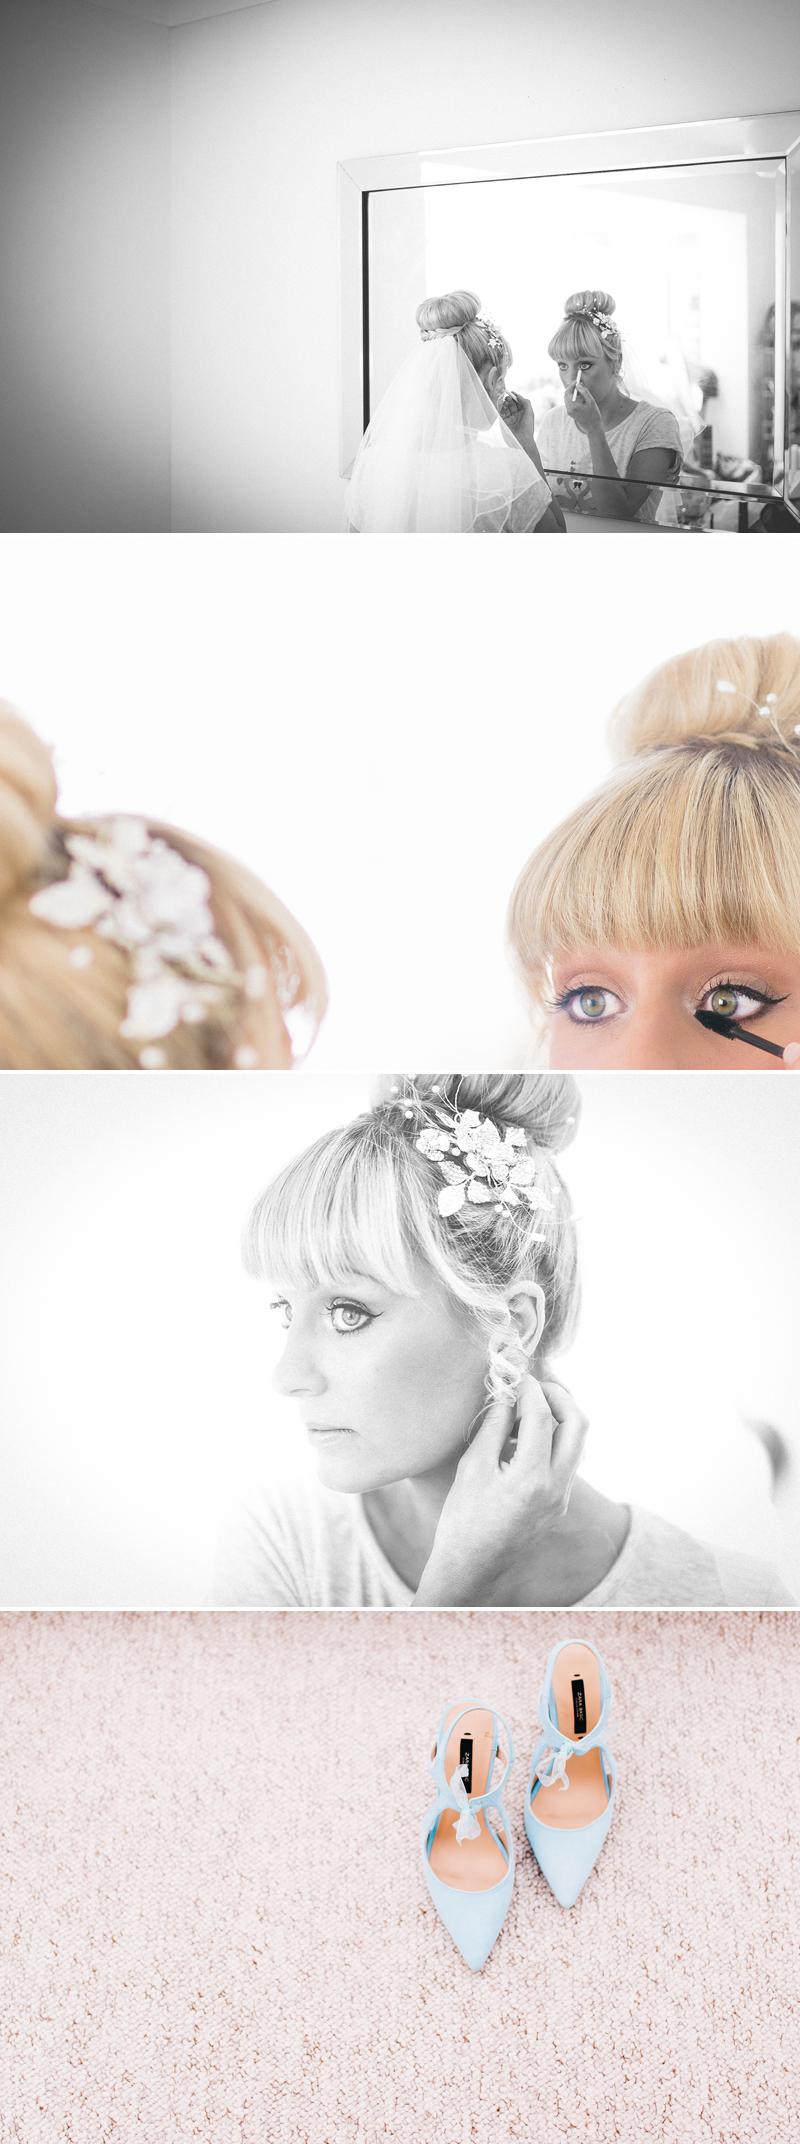 beauty photography stunning bride